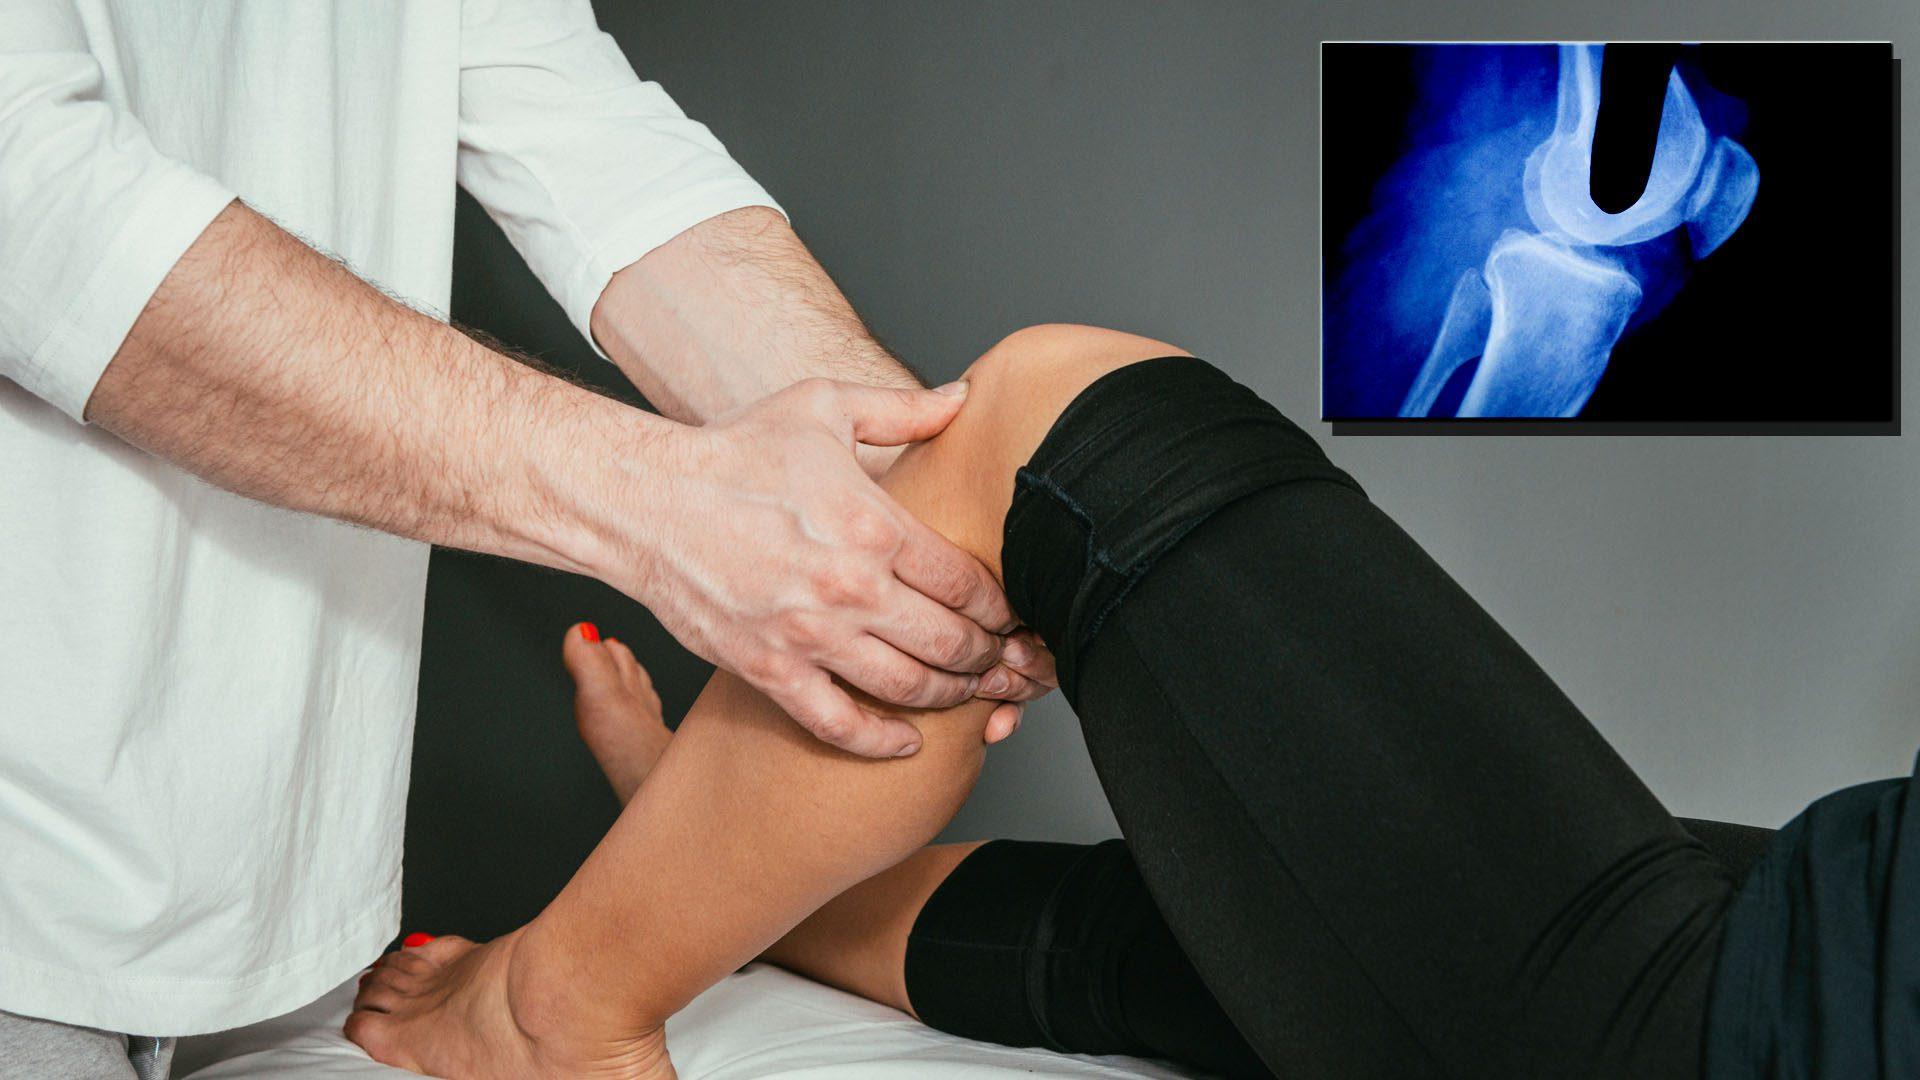 dolore al ginocchio trauma acuto el paso tx.